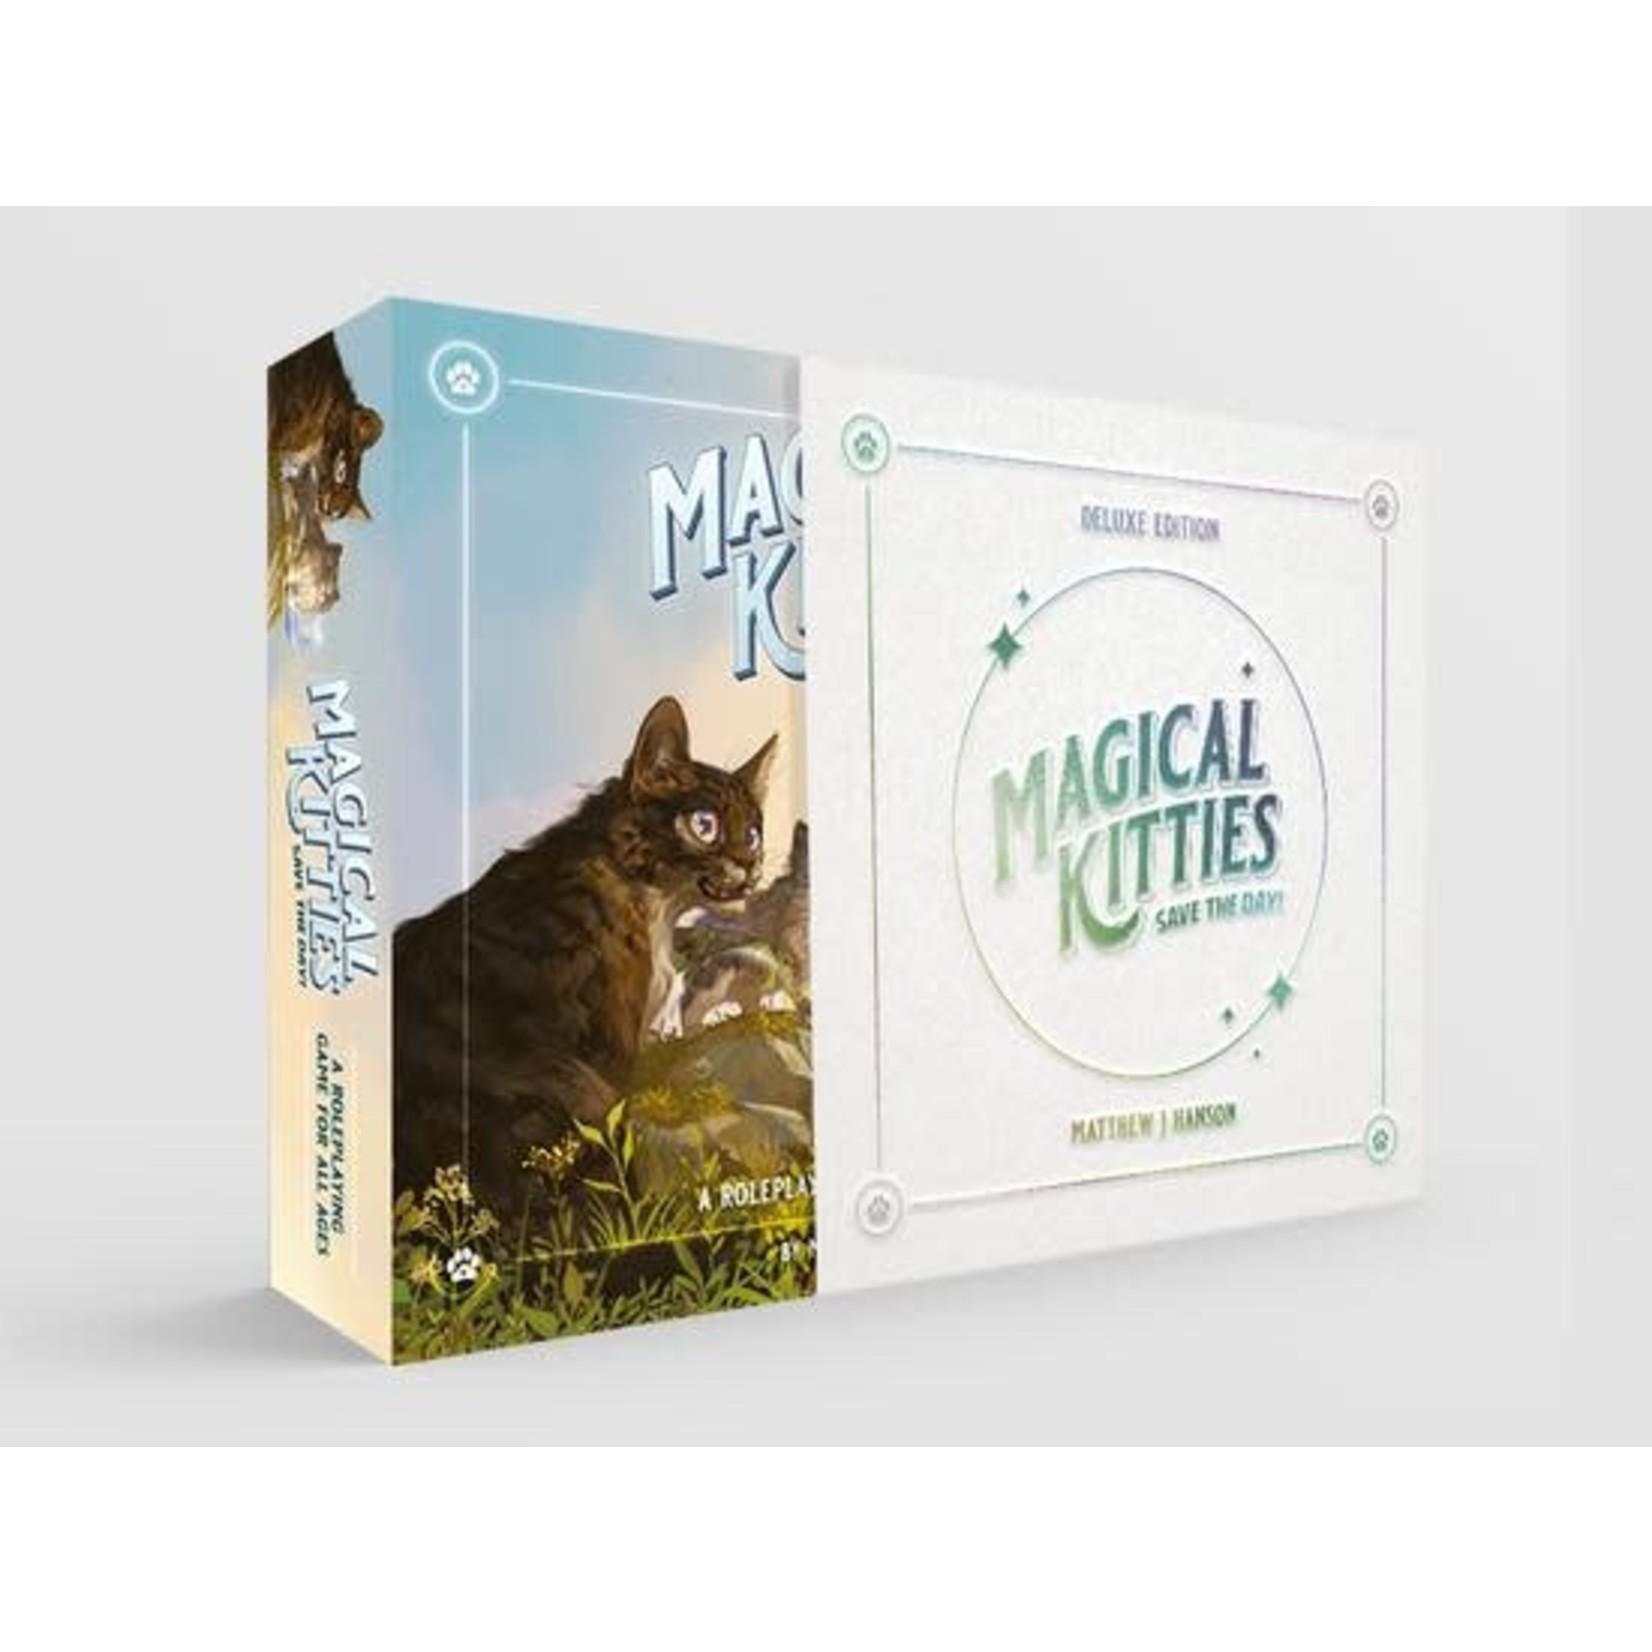 Atlas Games Magical Kitties Save the Day (Kickstarter) - Deluxe